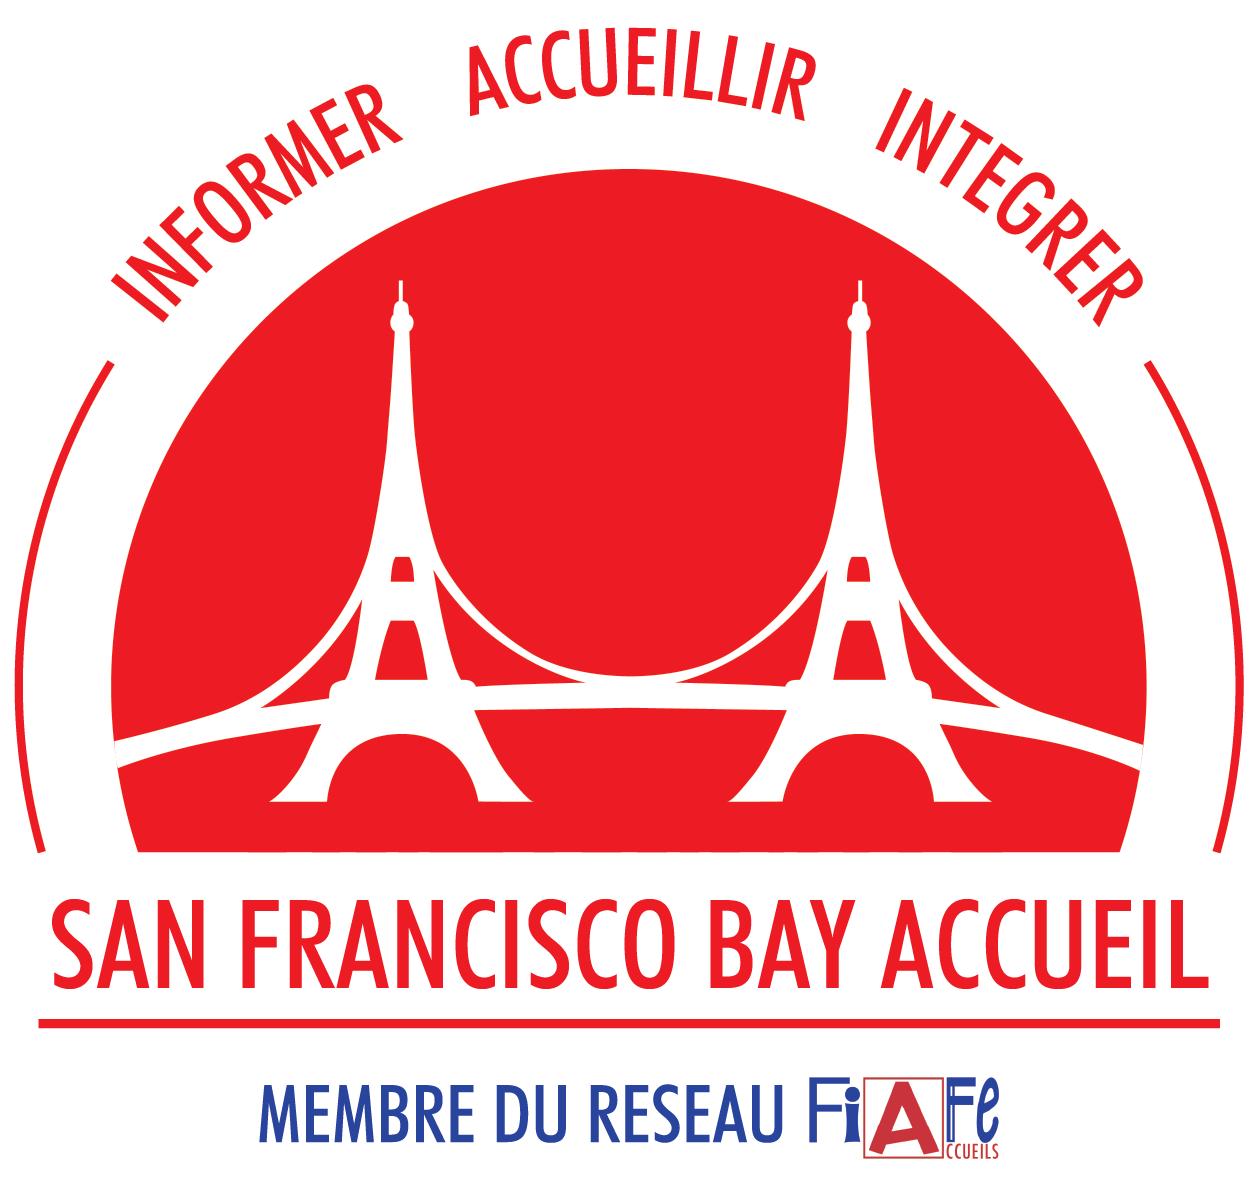 San Francisco Bay Accueil